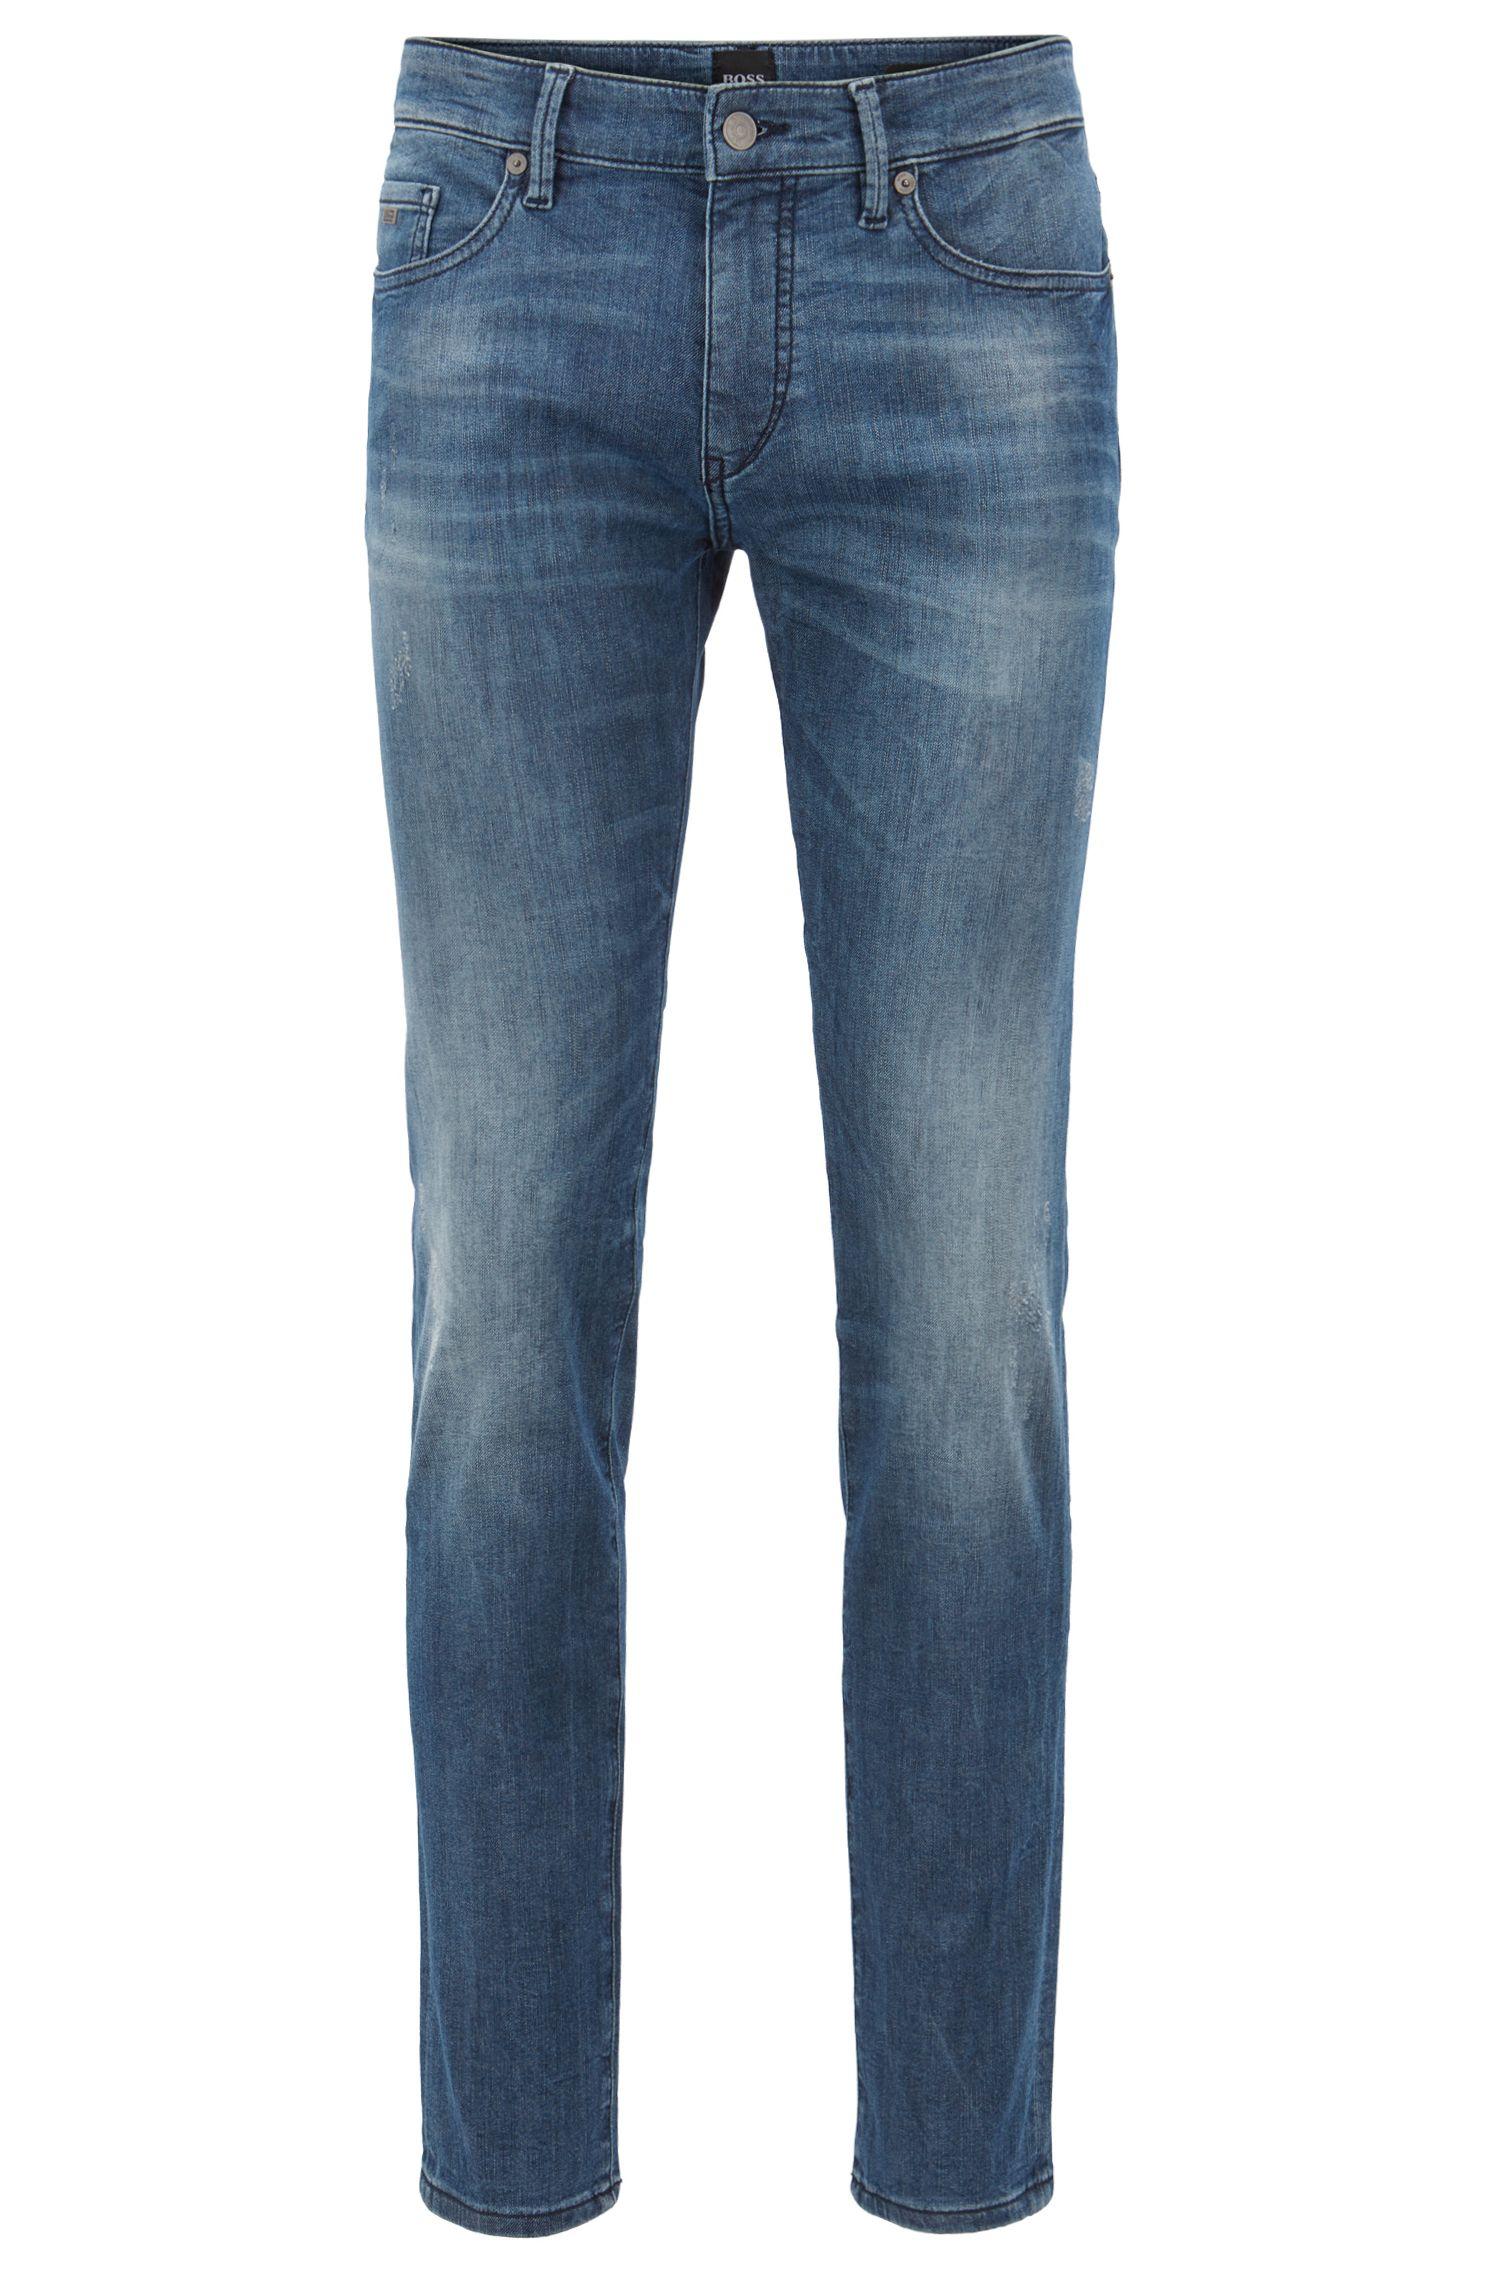 Skinny-Fit Jeans aus gestricktem Stretch-Denim, Blau